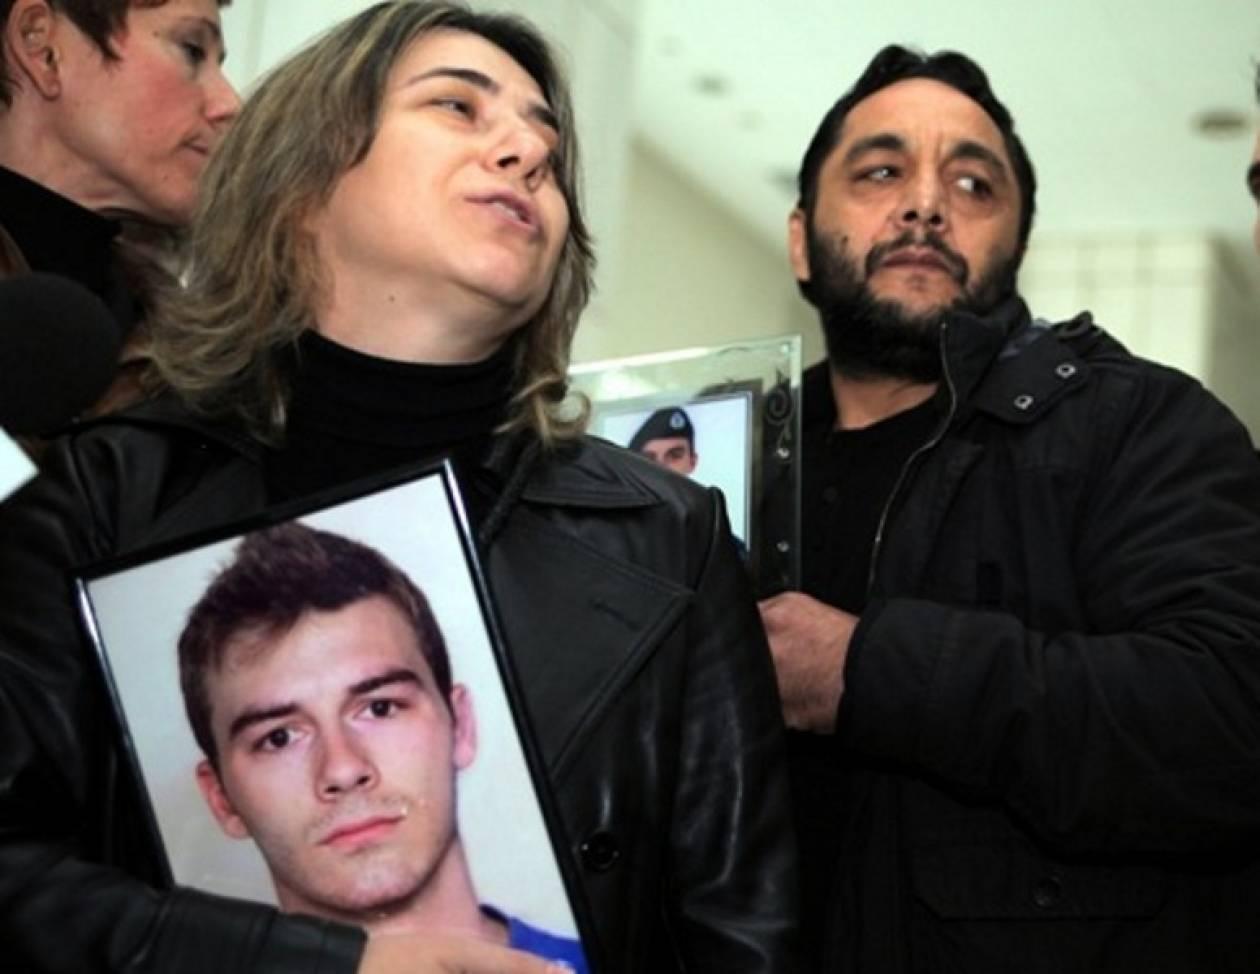 Oδυνηρές οι μαρτυρίες για τη δολοφονία των αστυνομικών του Ρέντη